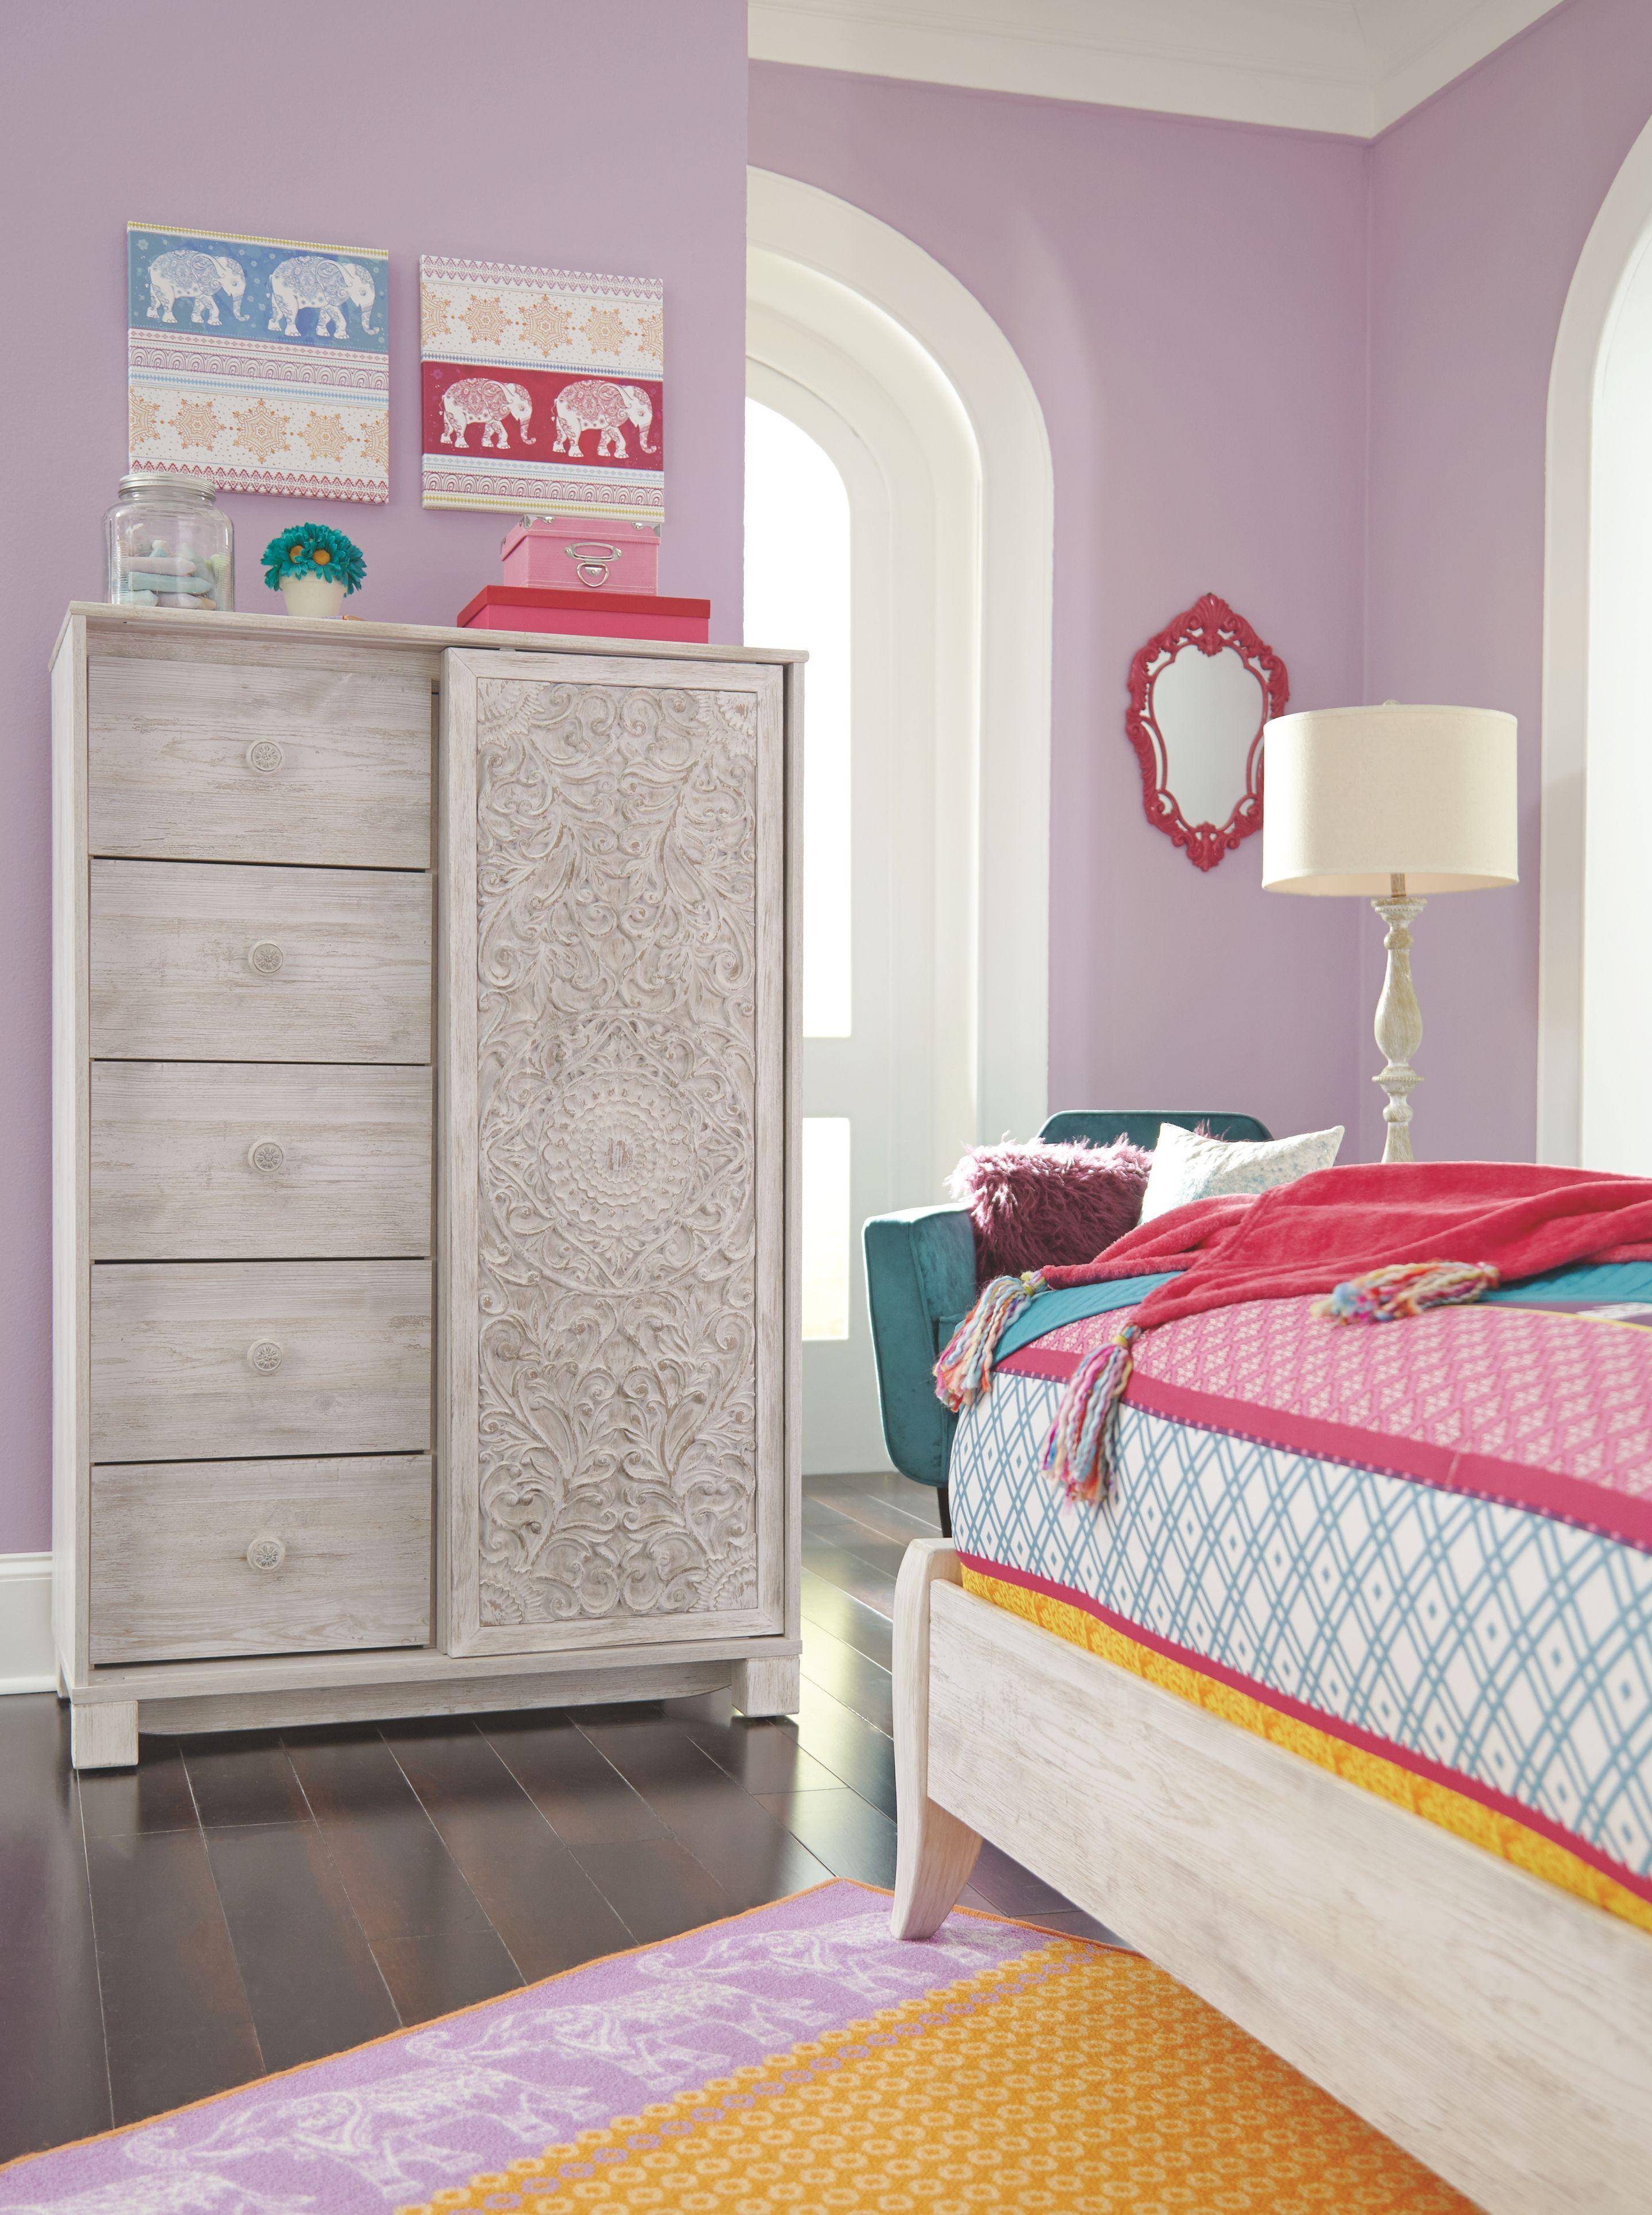 Paxberry Dressing Chest, Whitewash Bedroom storage